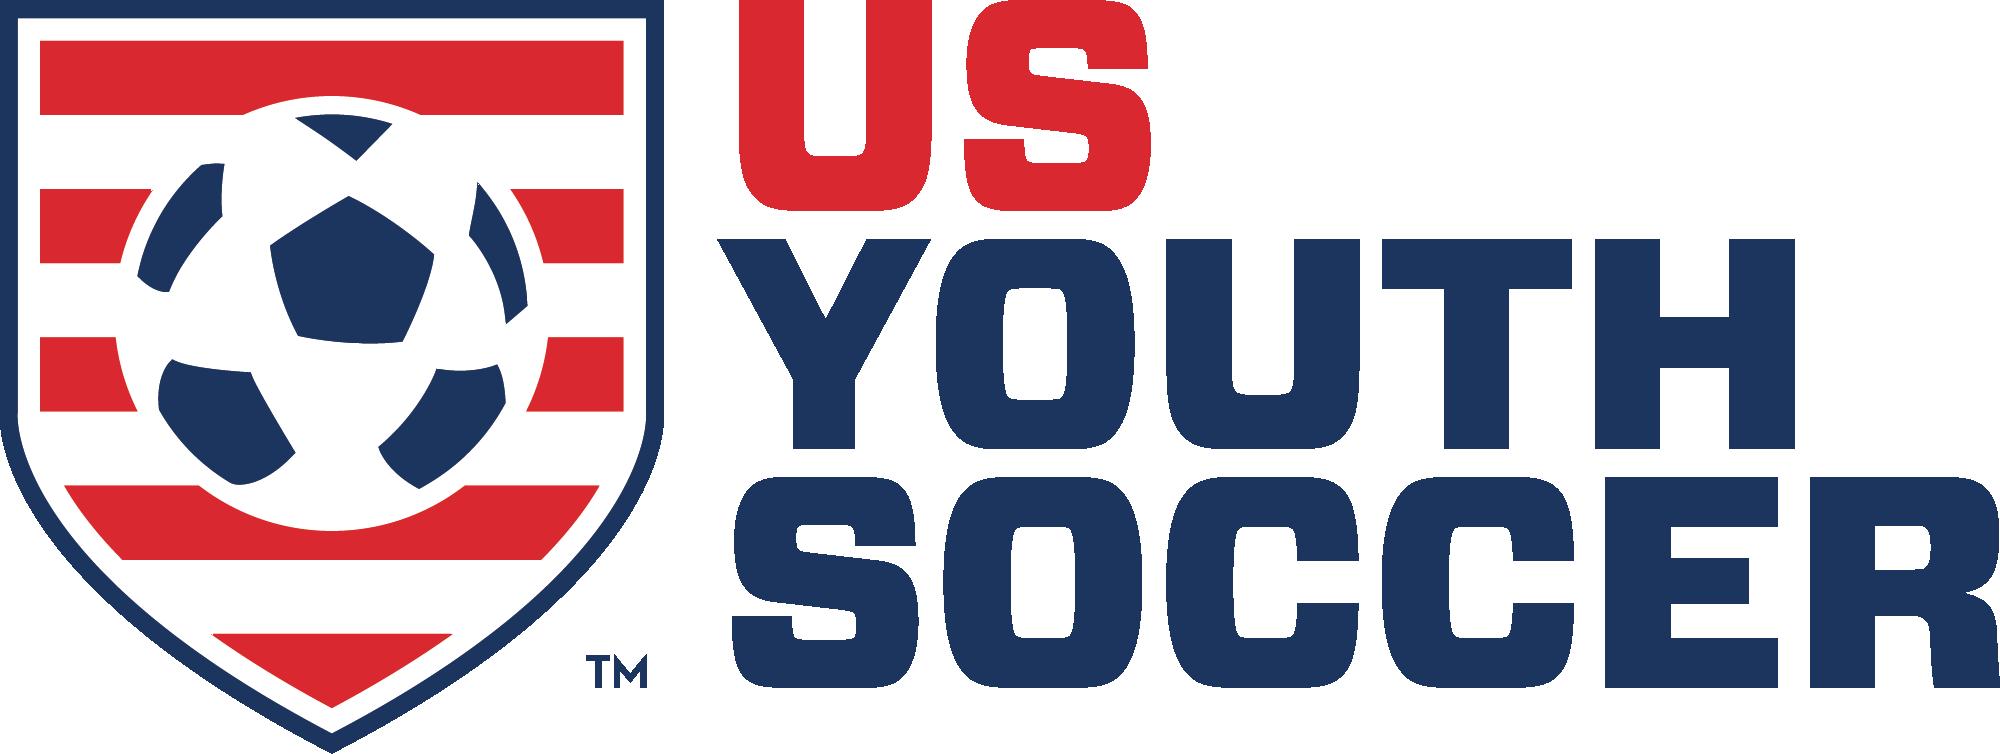 USYS logo